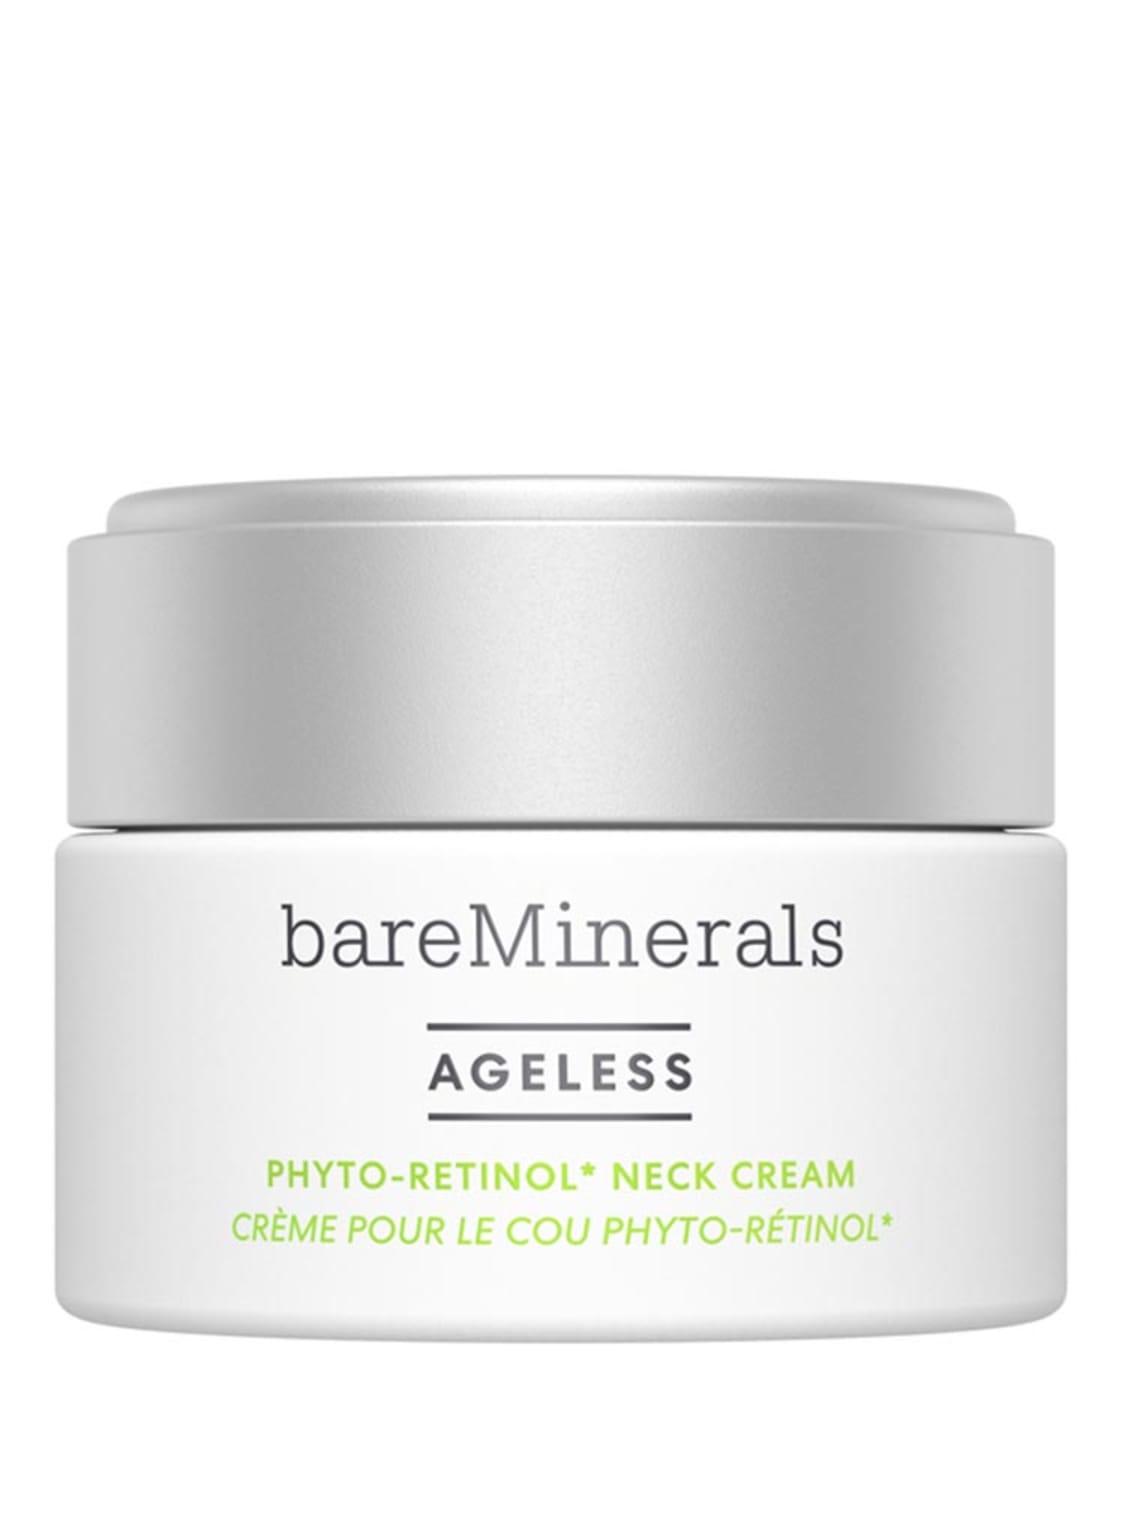 Image of Bareminerals Ageless Phyto-Retinol Neck Cream 50 gr